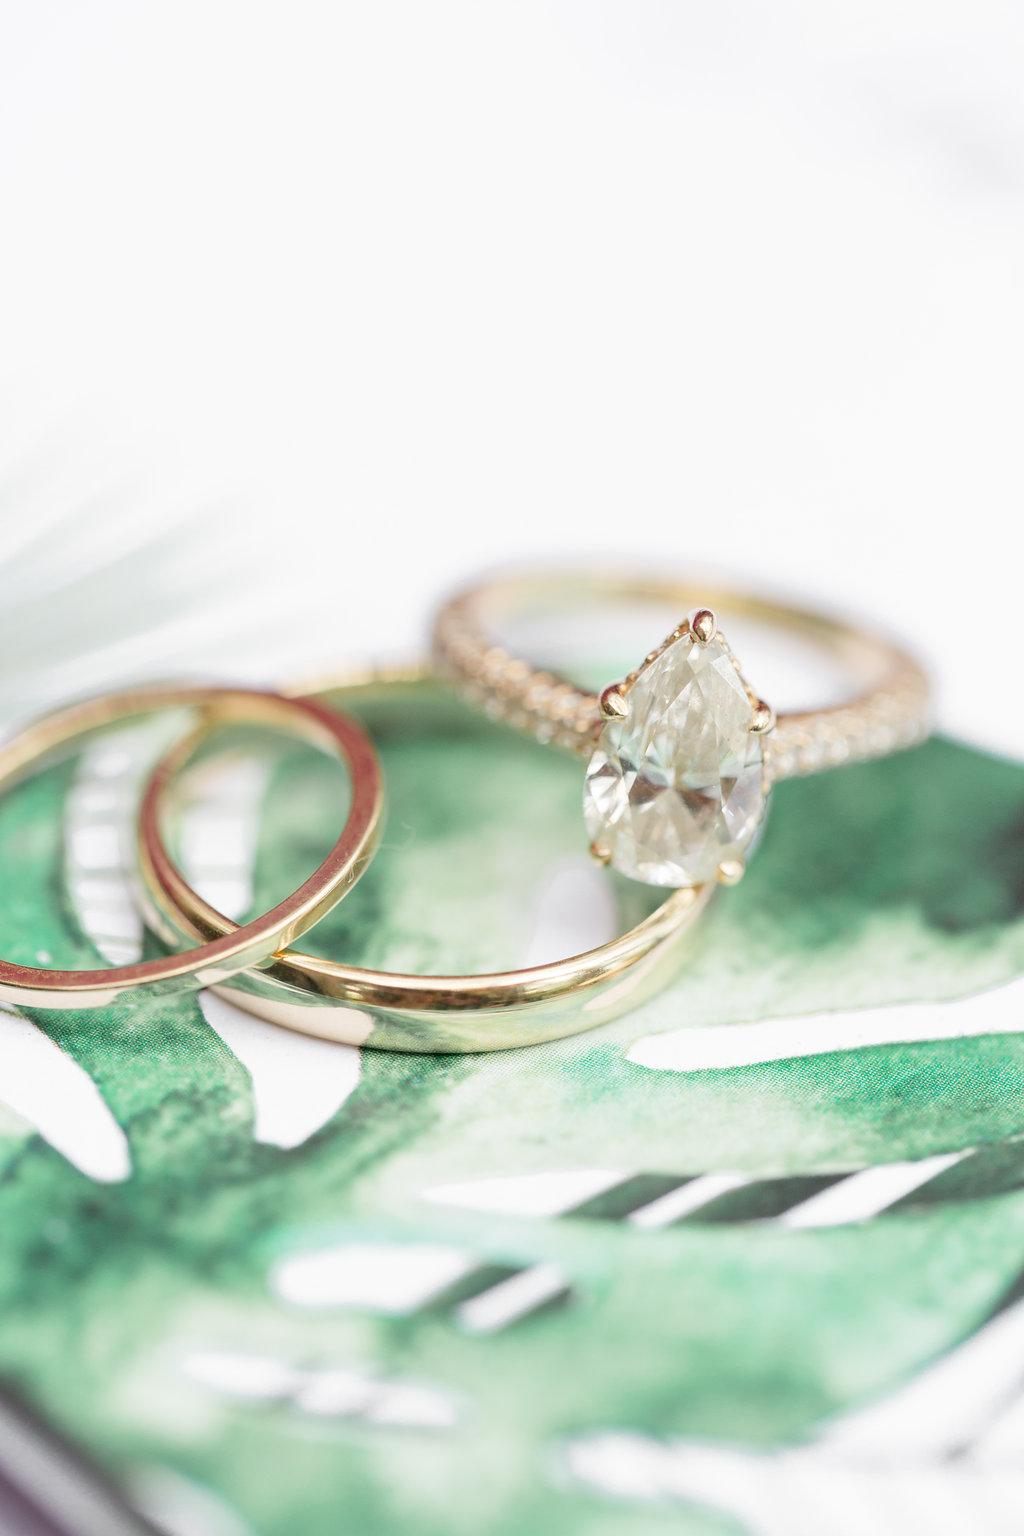 Gold Pear Engagement Ring - Musgrove Plantation Georgia Wedding Venue